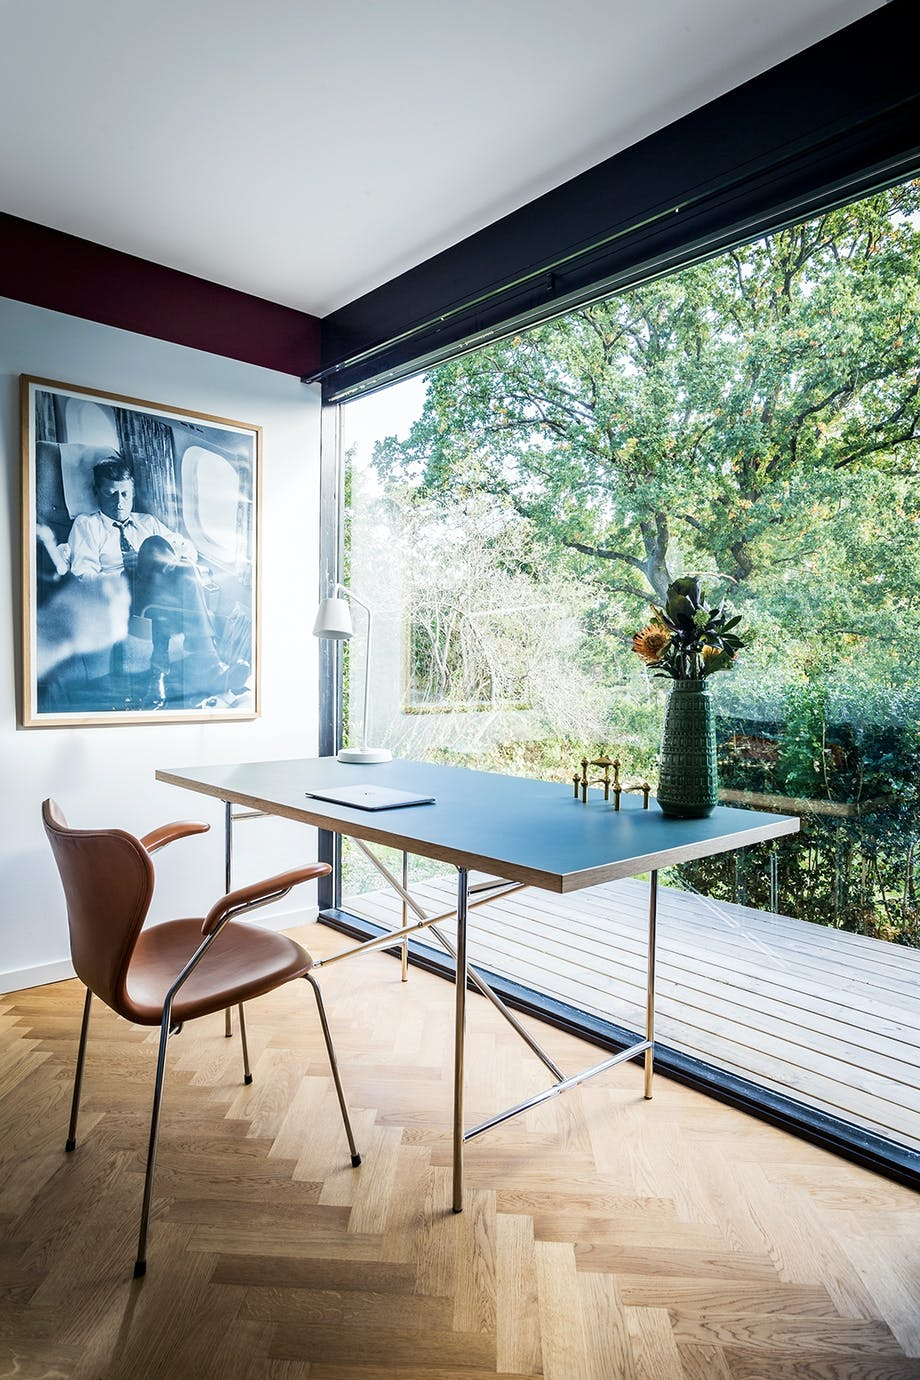 Hjemmekontor dansk design stol stort vindueparti